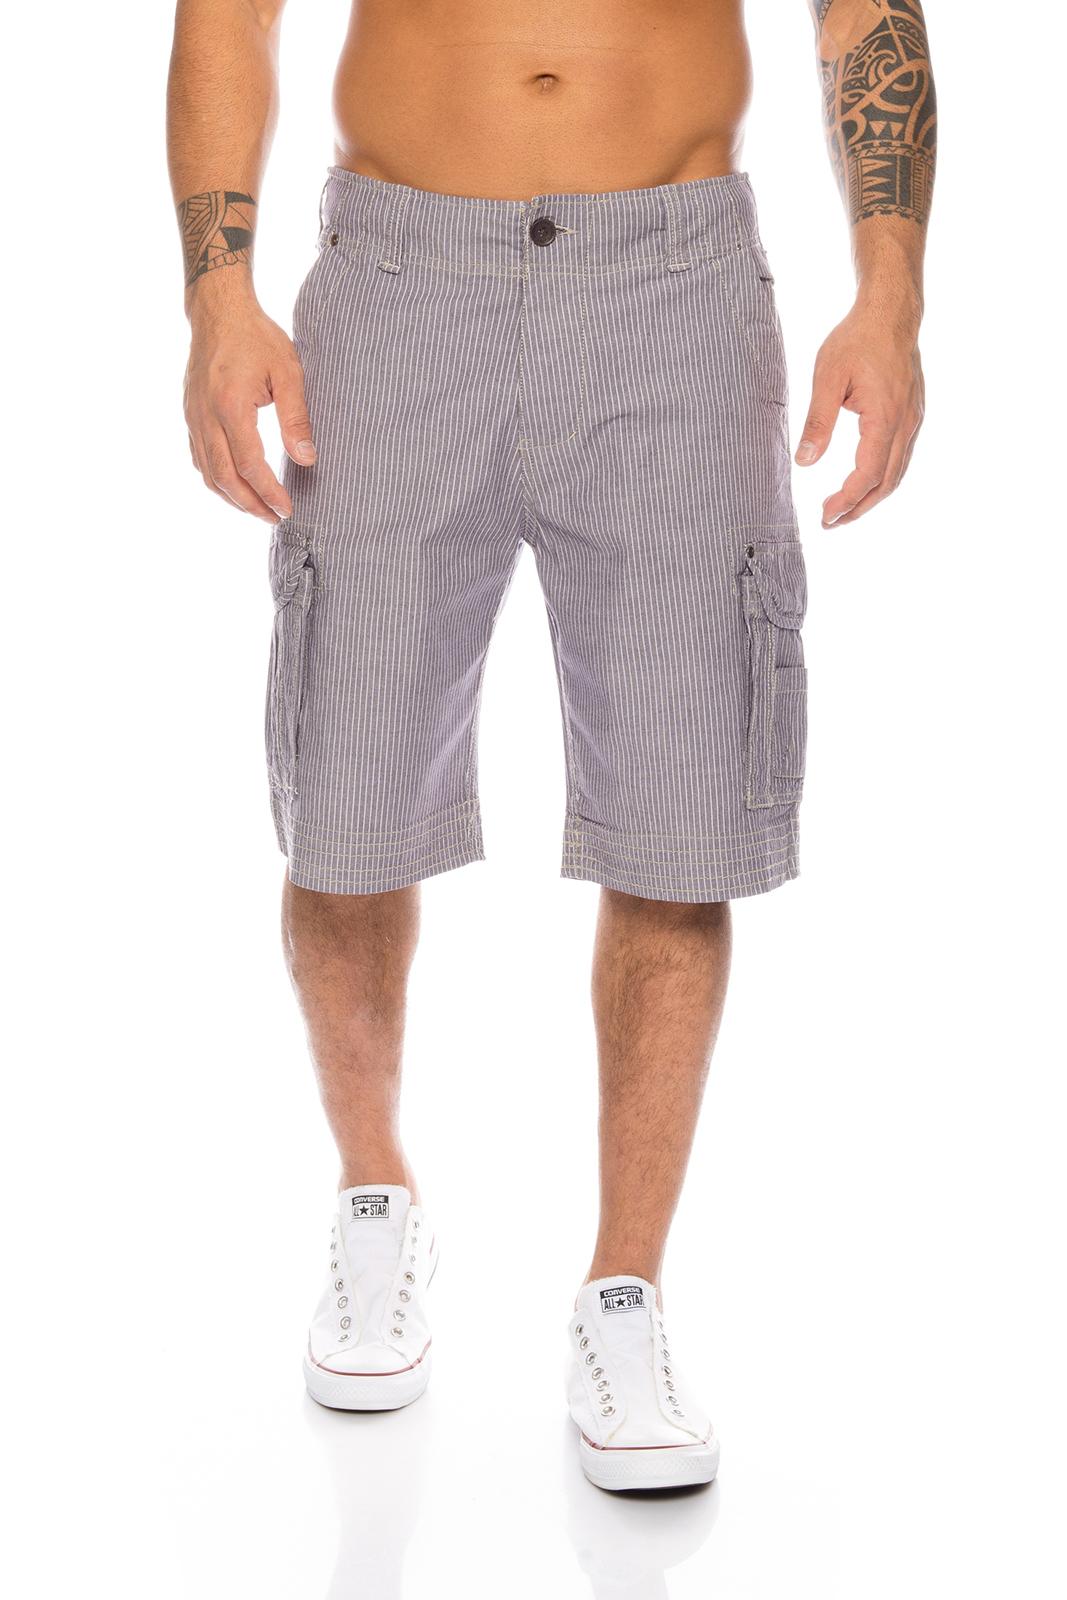 herren bermuda sommer short kurze hose capri karo shorts. Black Bedroom Furniture Sets. Home Design Ideas